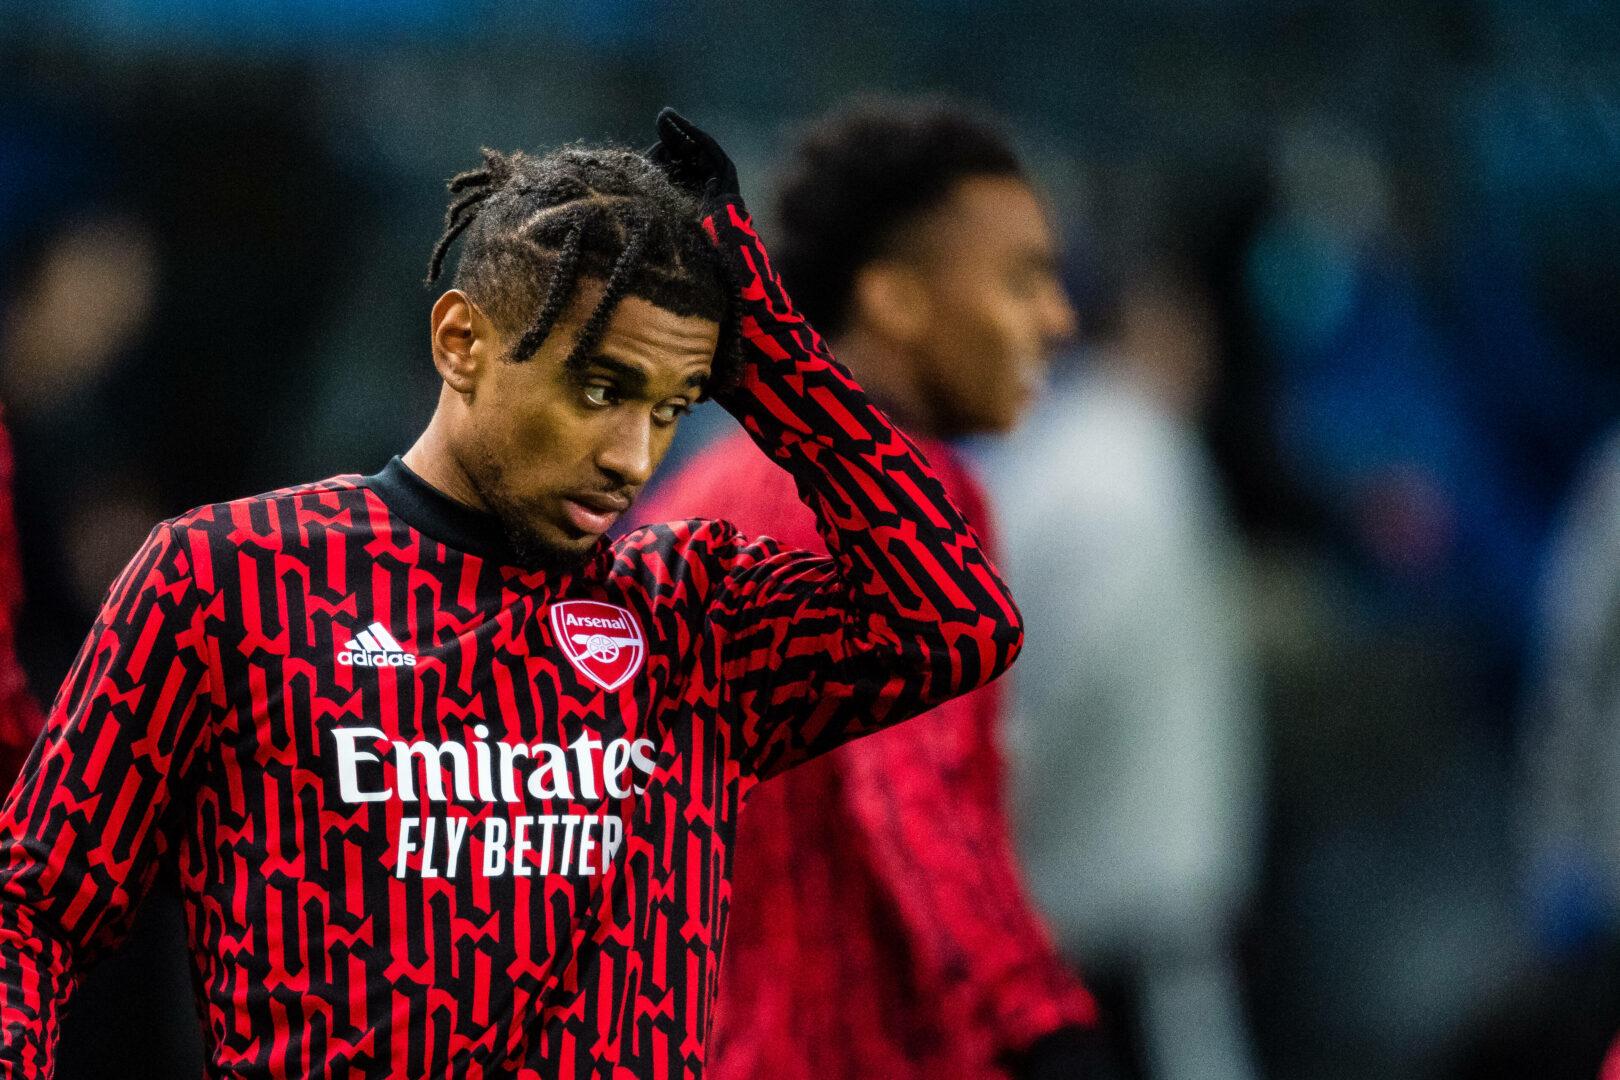 Nelson im Dress des FC Arsenal